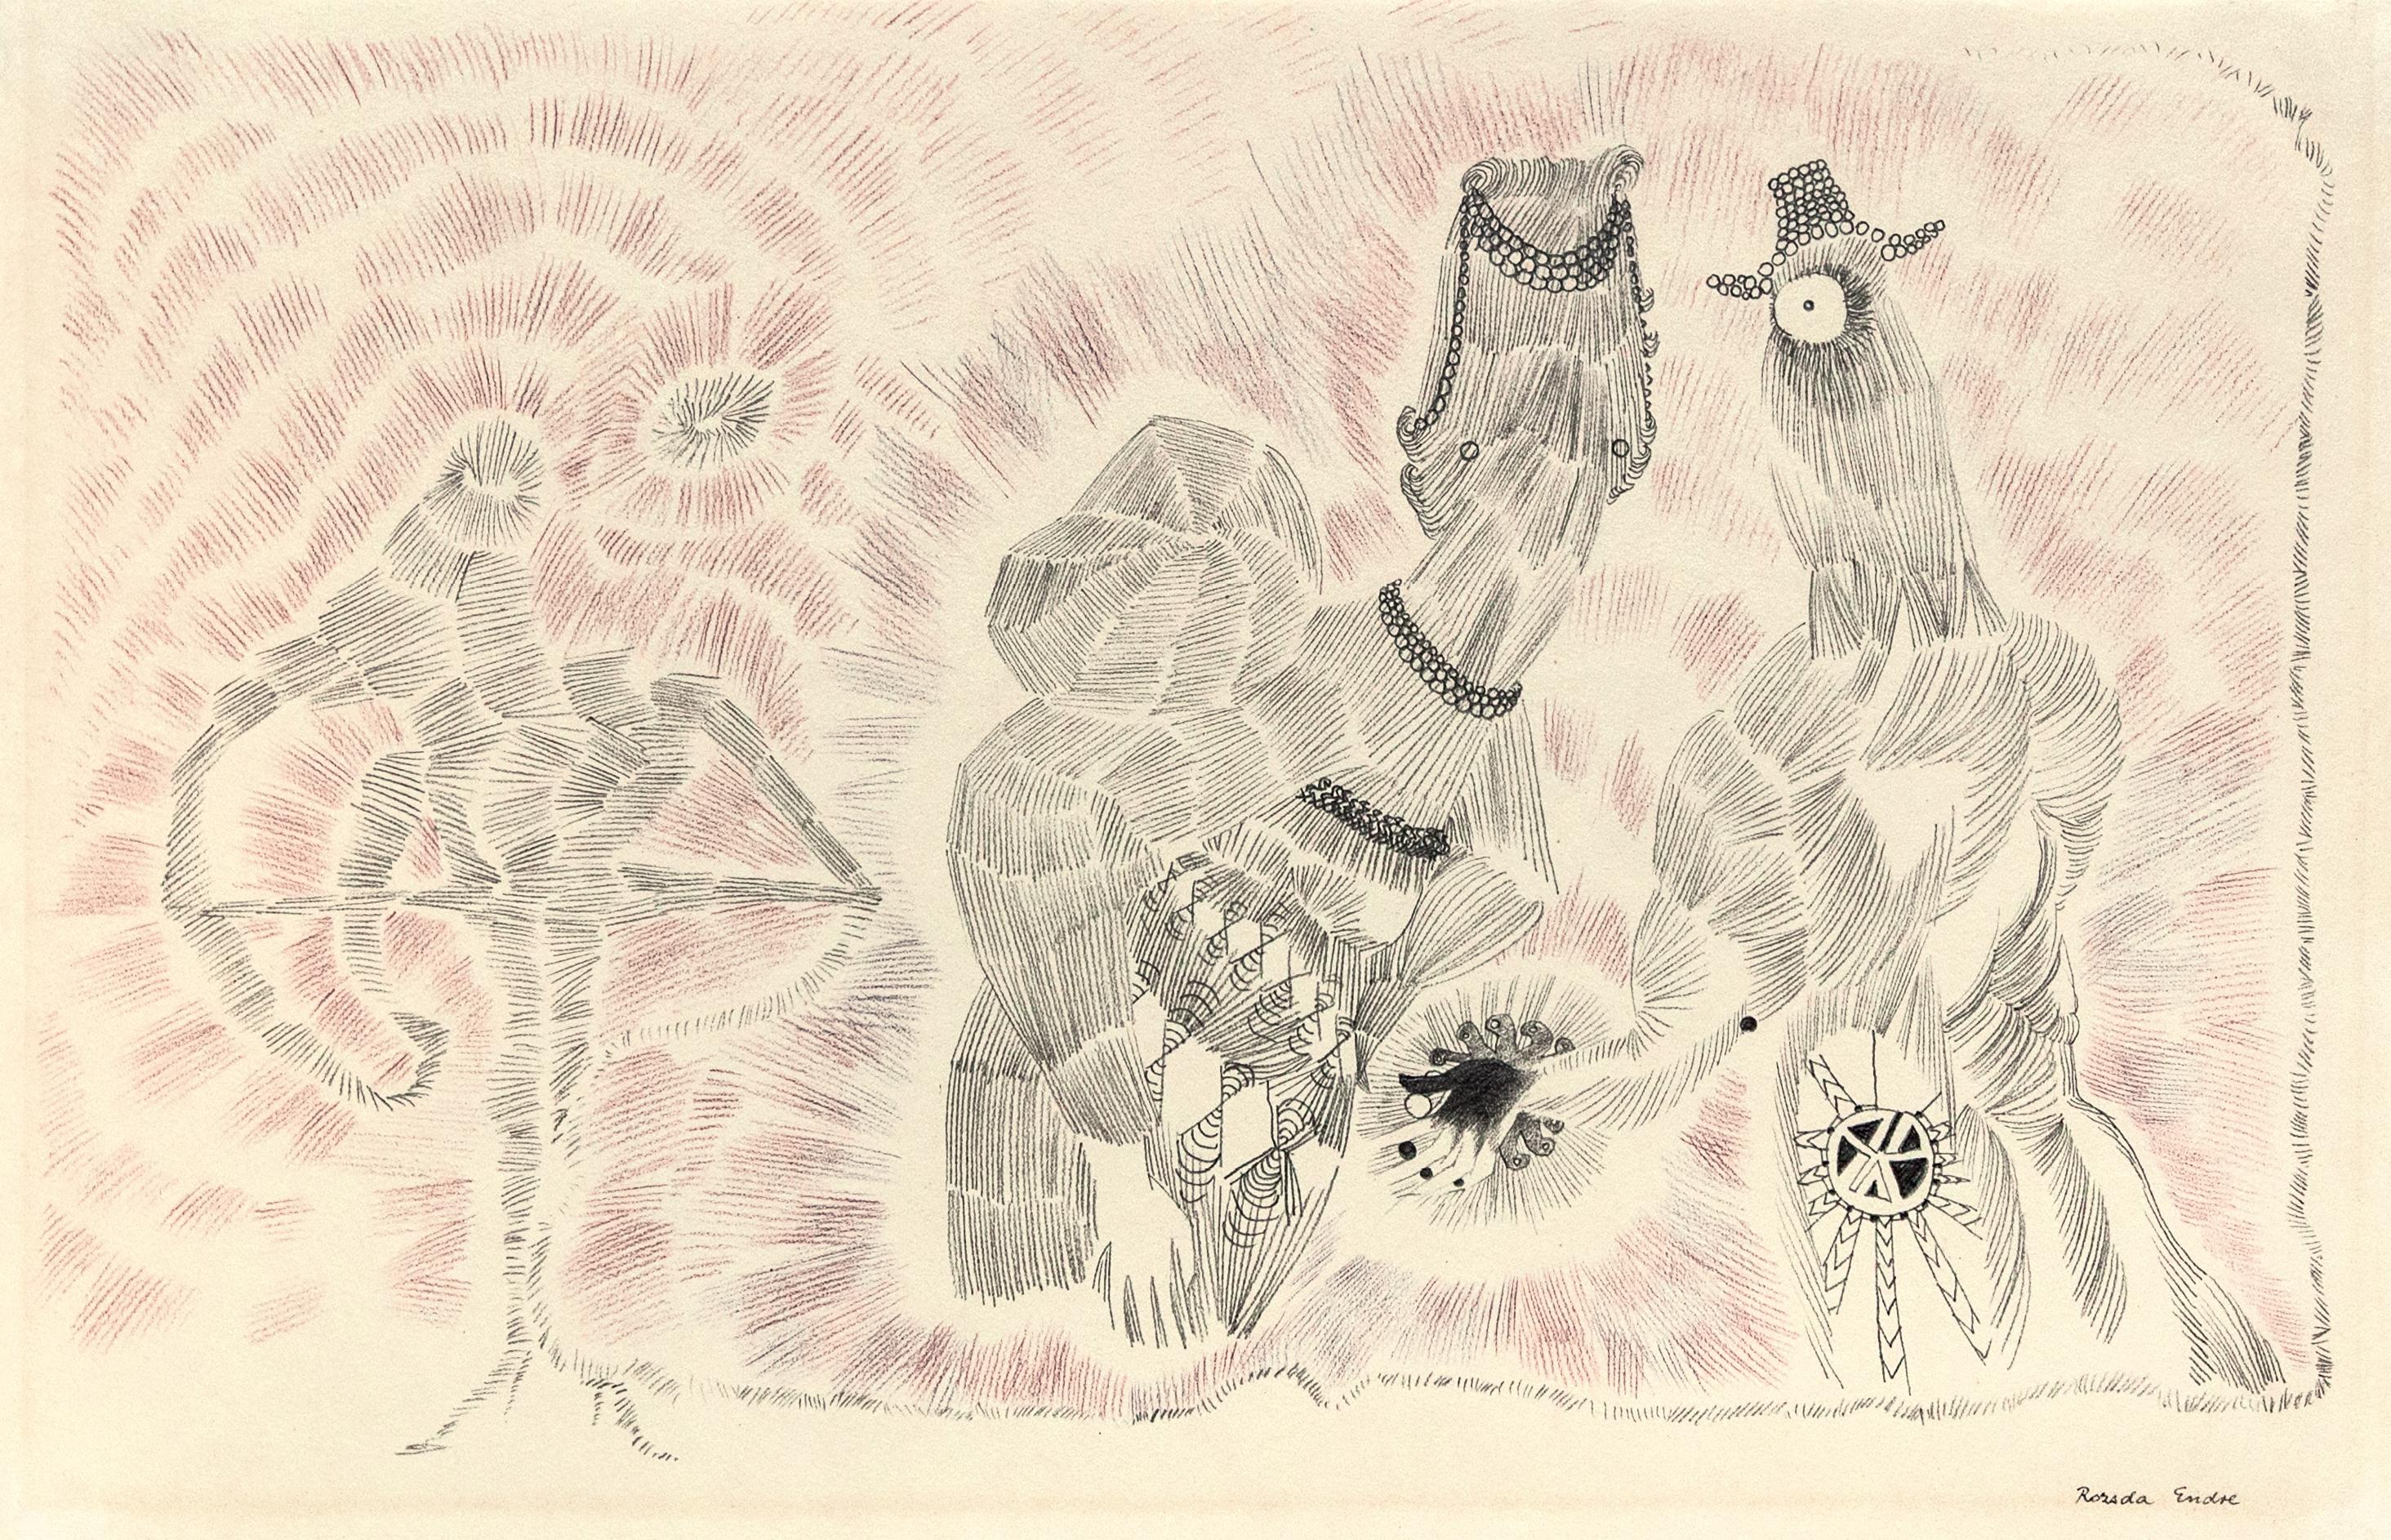 Endre Rozsda - Trois figures (1955)